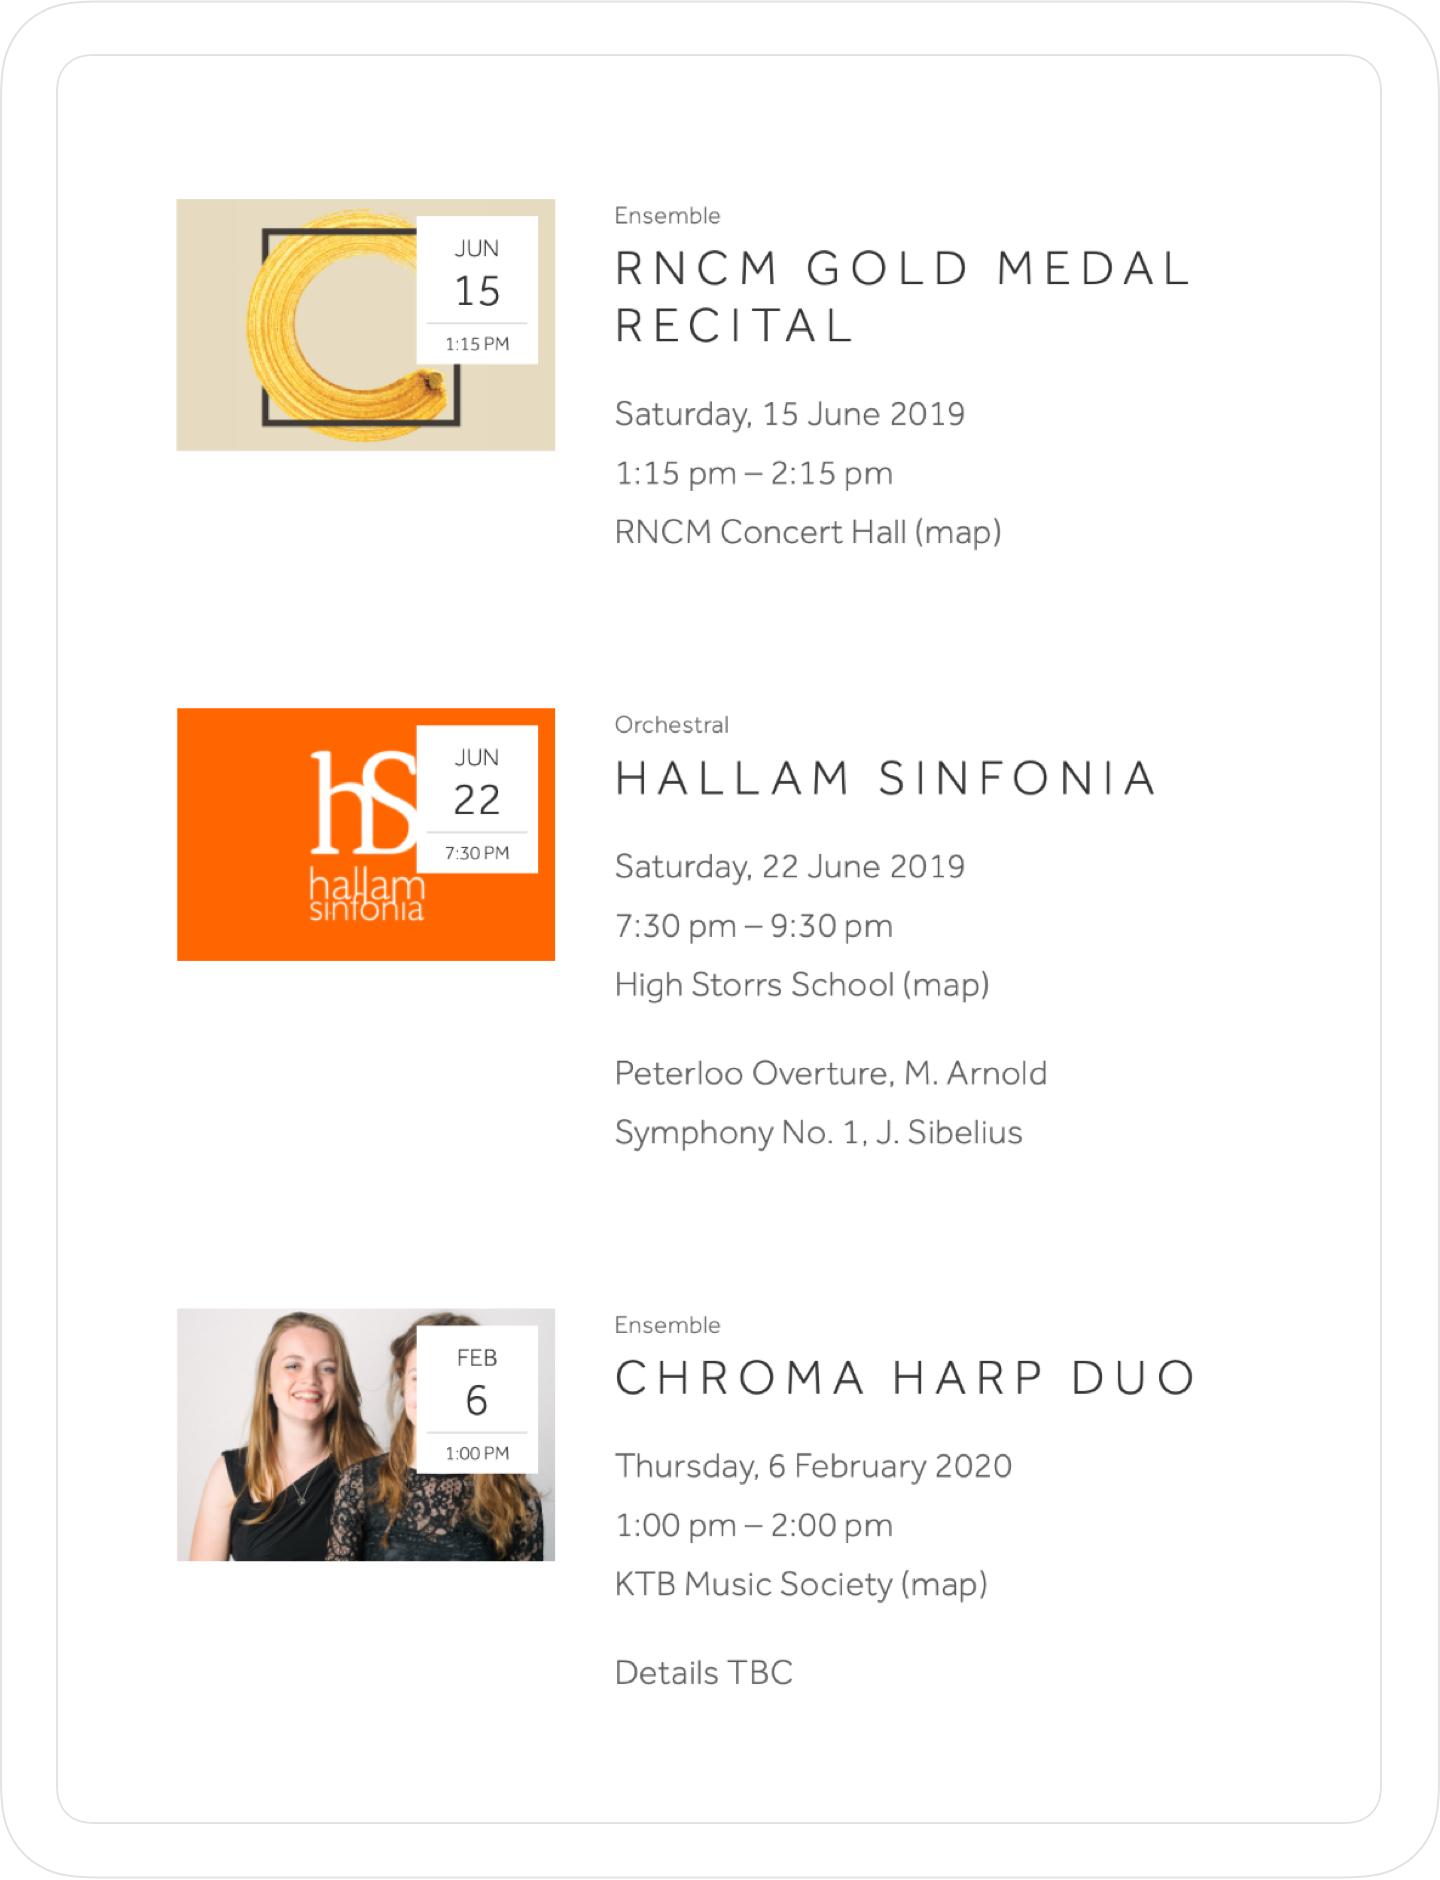 Responsive, simple, modern event calendar and website design by Jack Watkins for award winning classical musician and harpist, Lucy Nolan